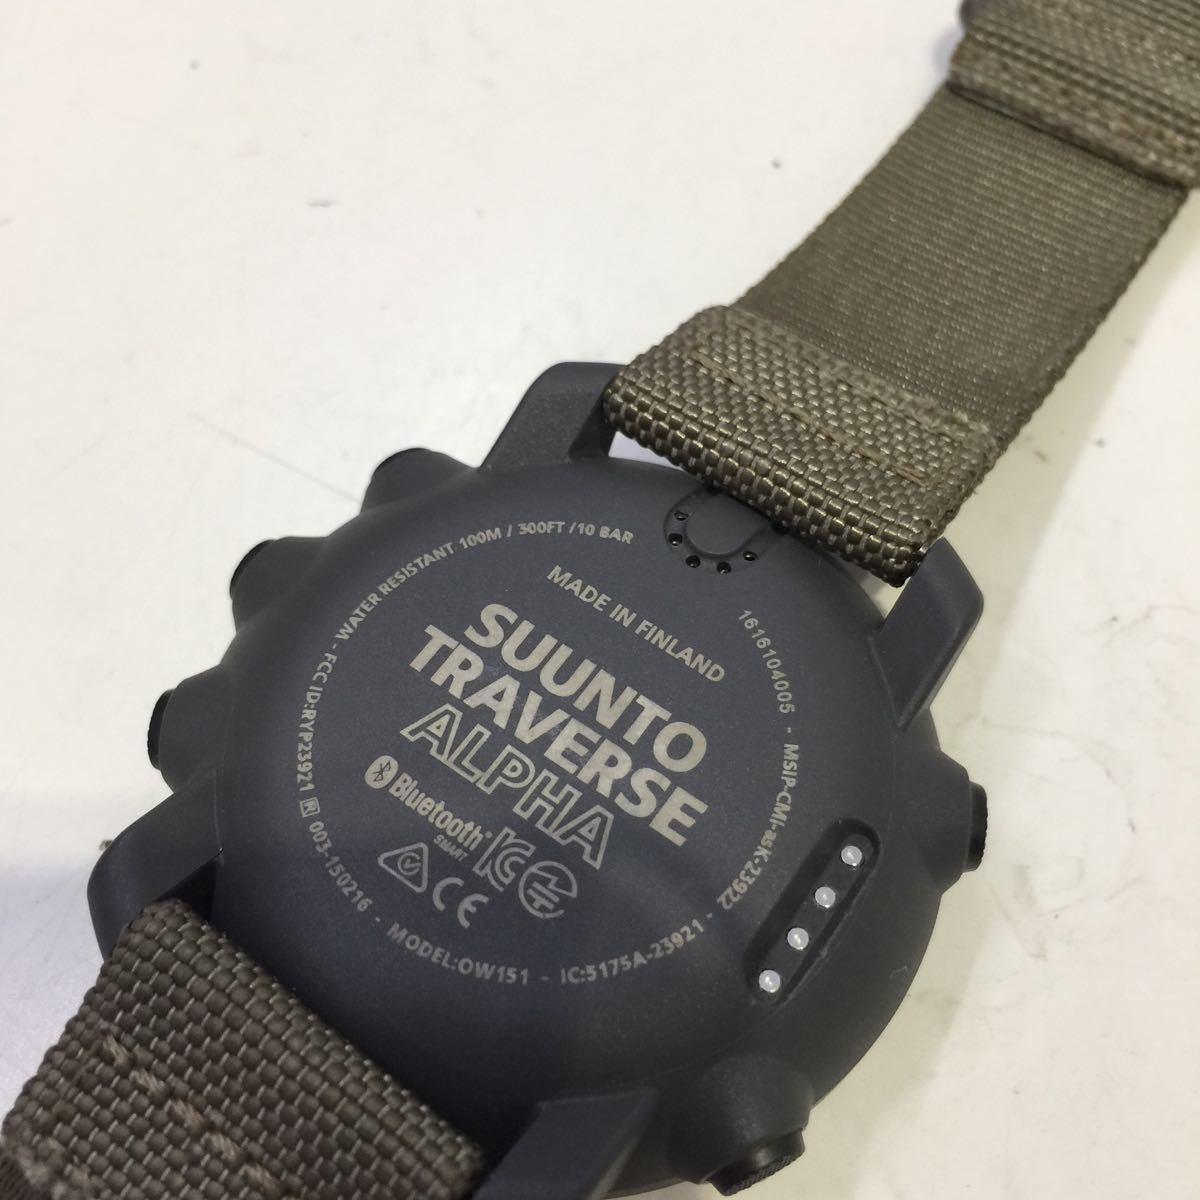 【SUUNTO スント】トラバースアルファフォリッジ TRAVERSE ALPHA FOLIAGE 腕時計 デジタル腕時計 デジタル アウトドアウォッチ アウトドア_画像9